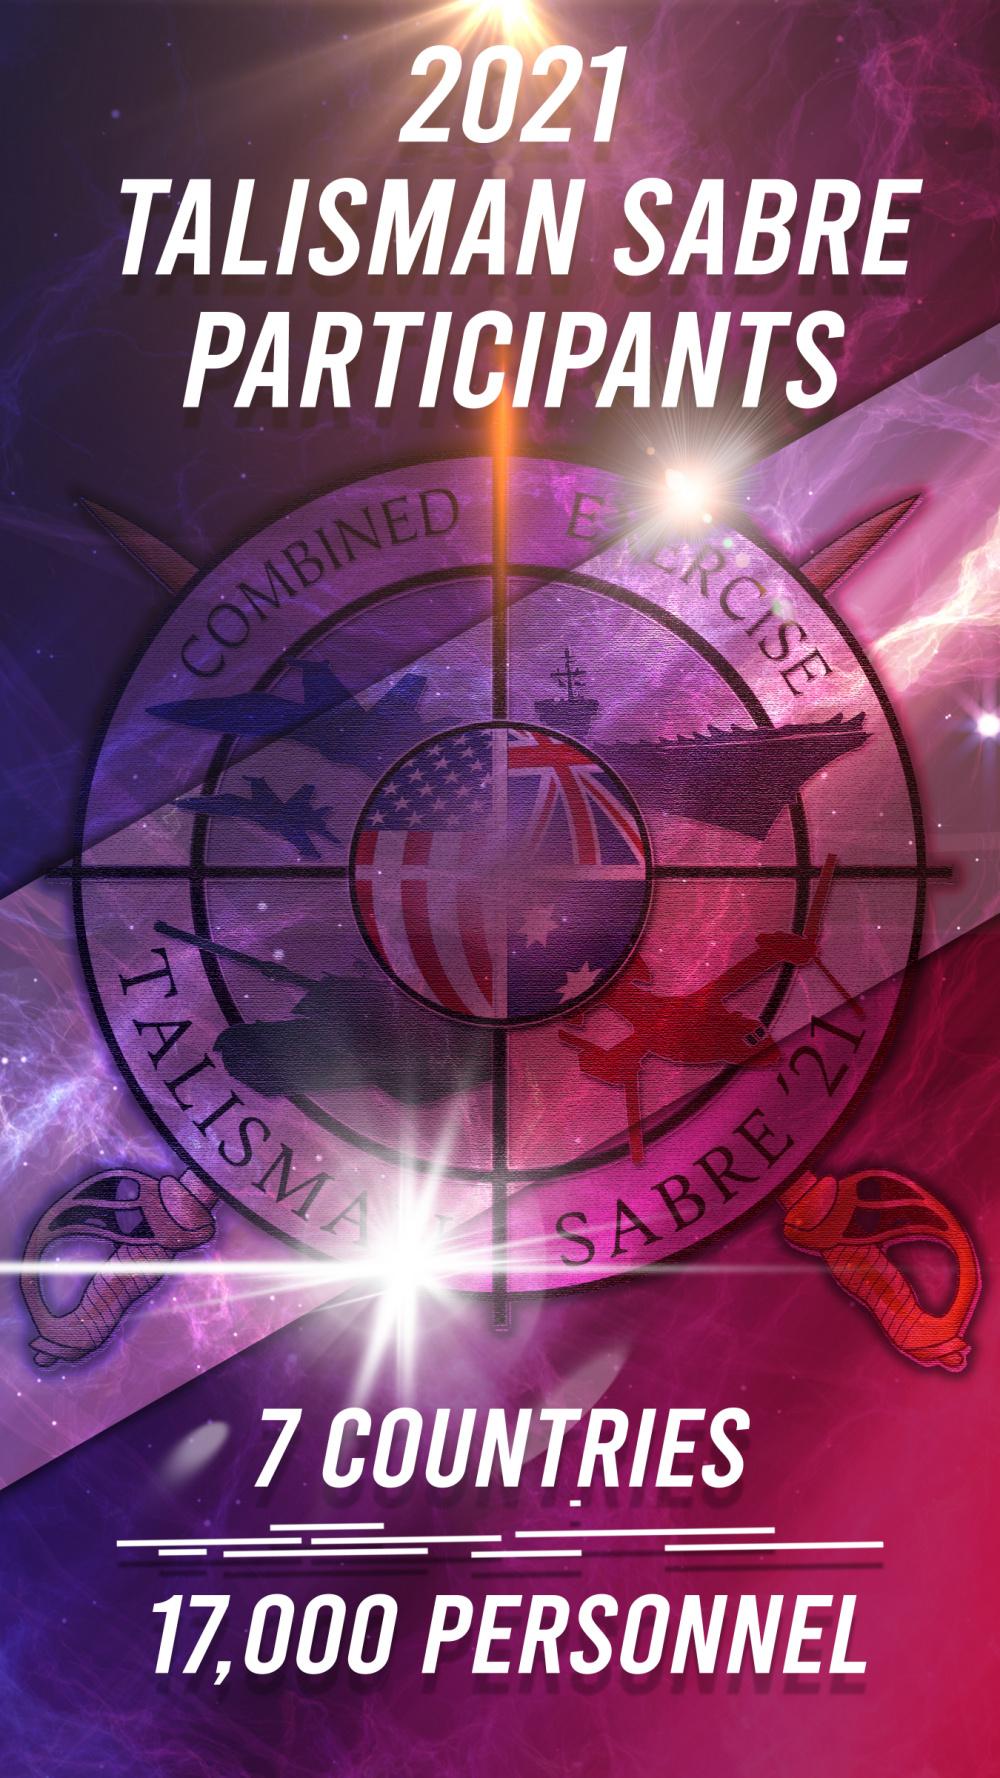 Talisman Sabre 21 Info Graphic